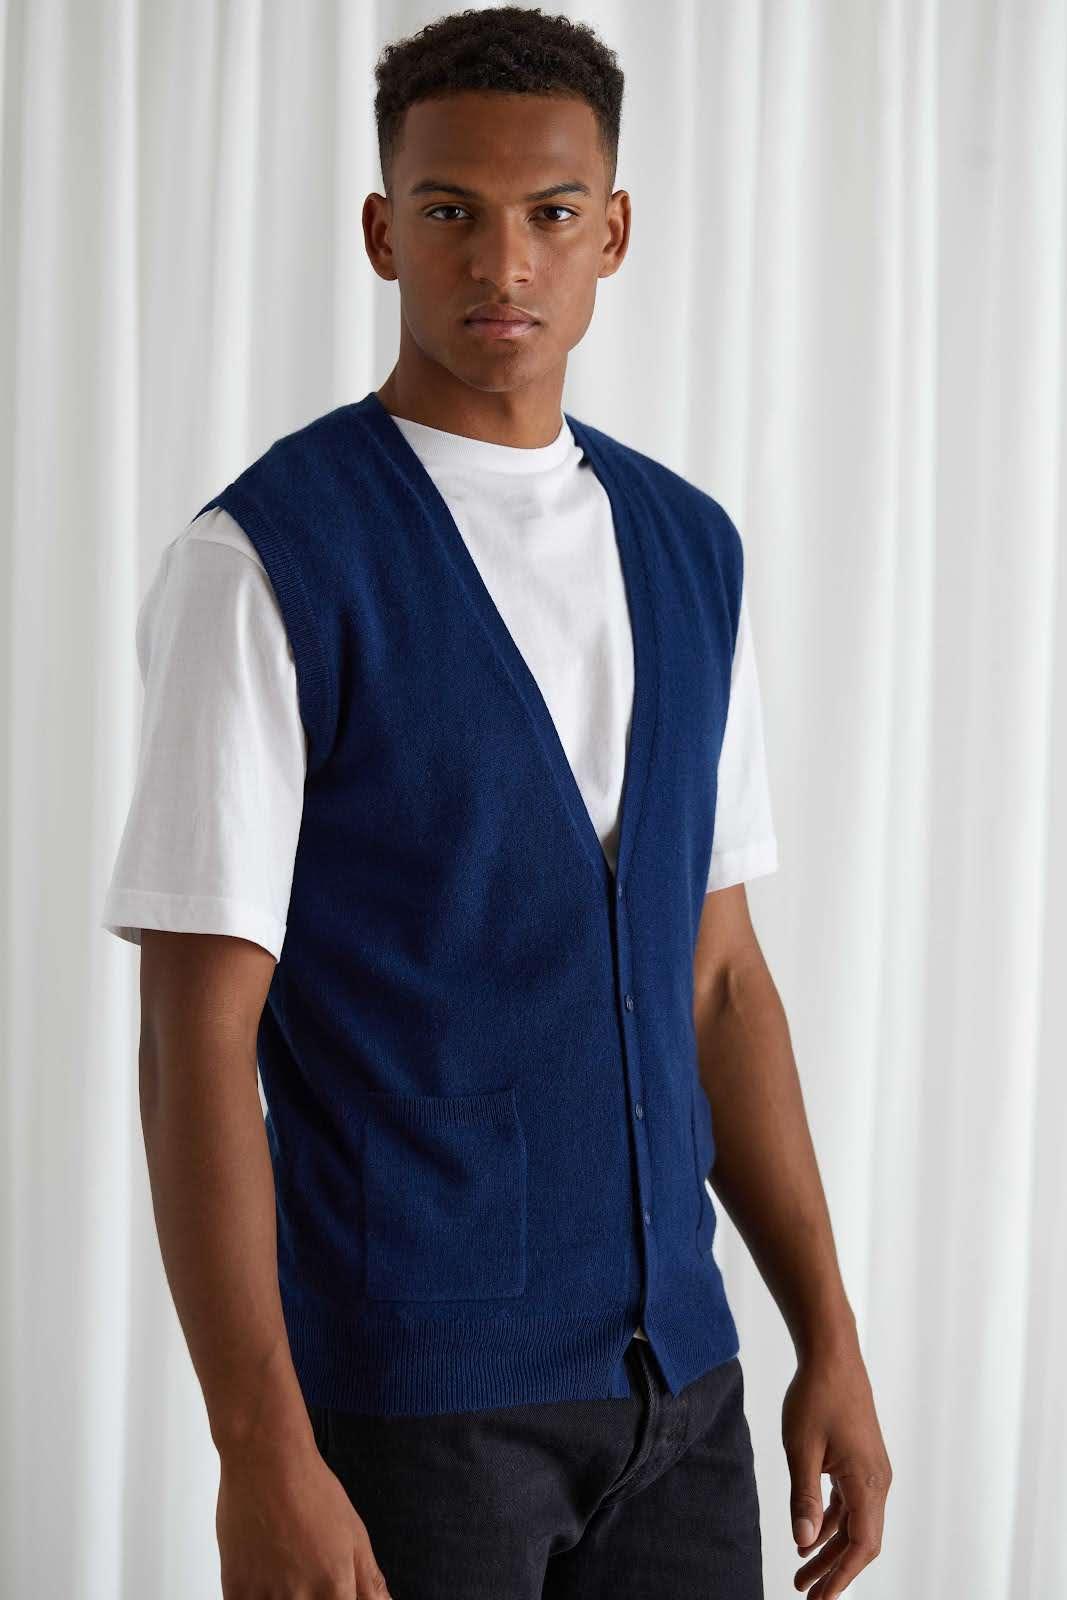 Man Cardigan Vest